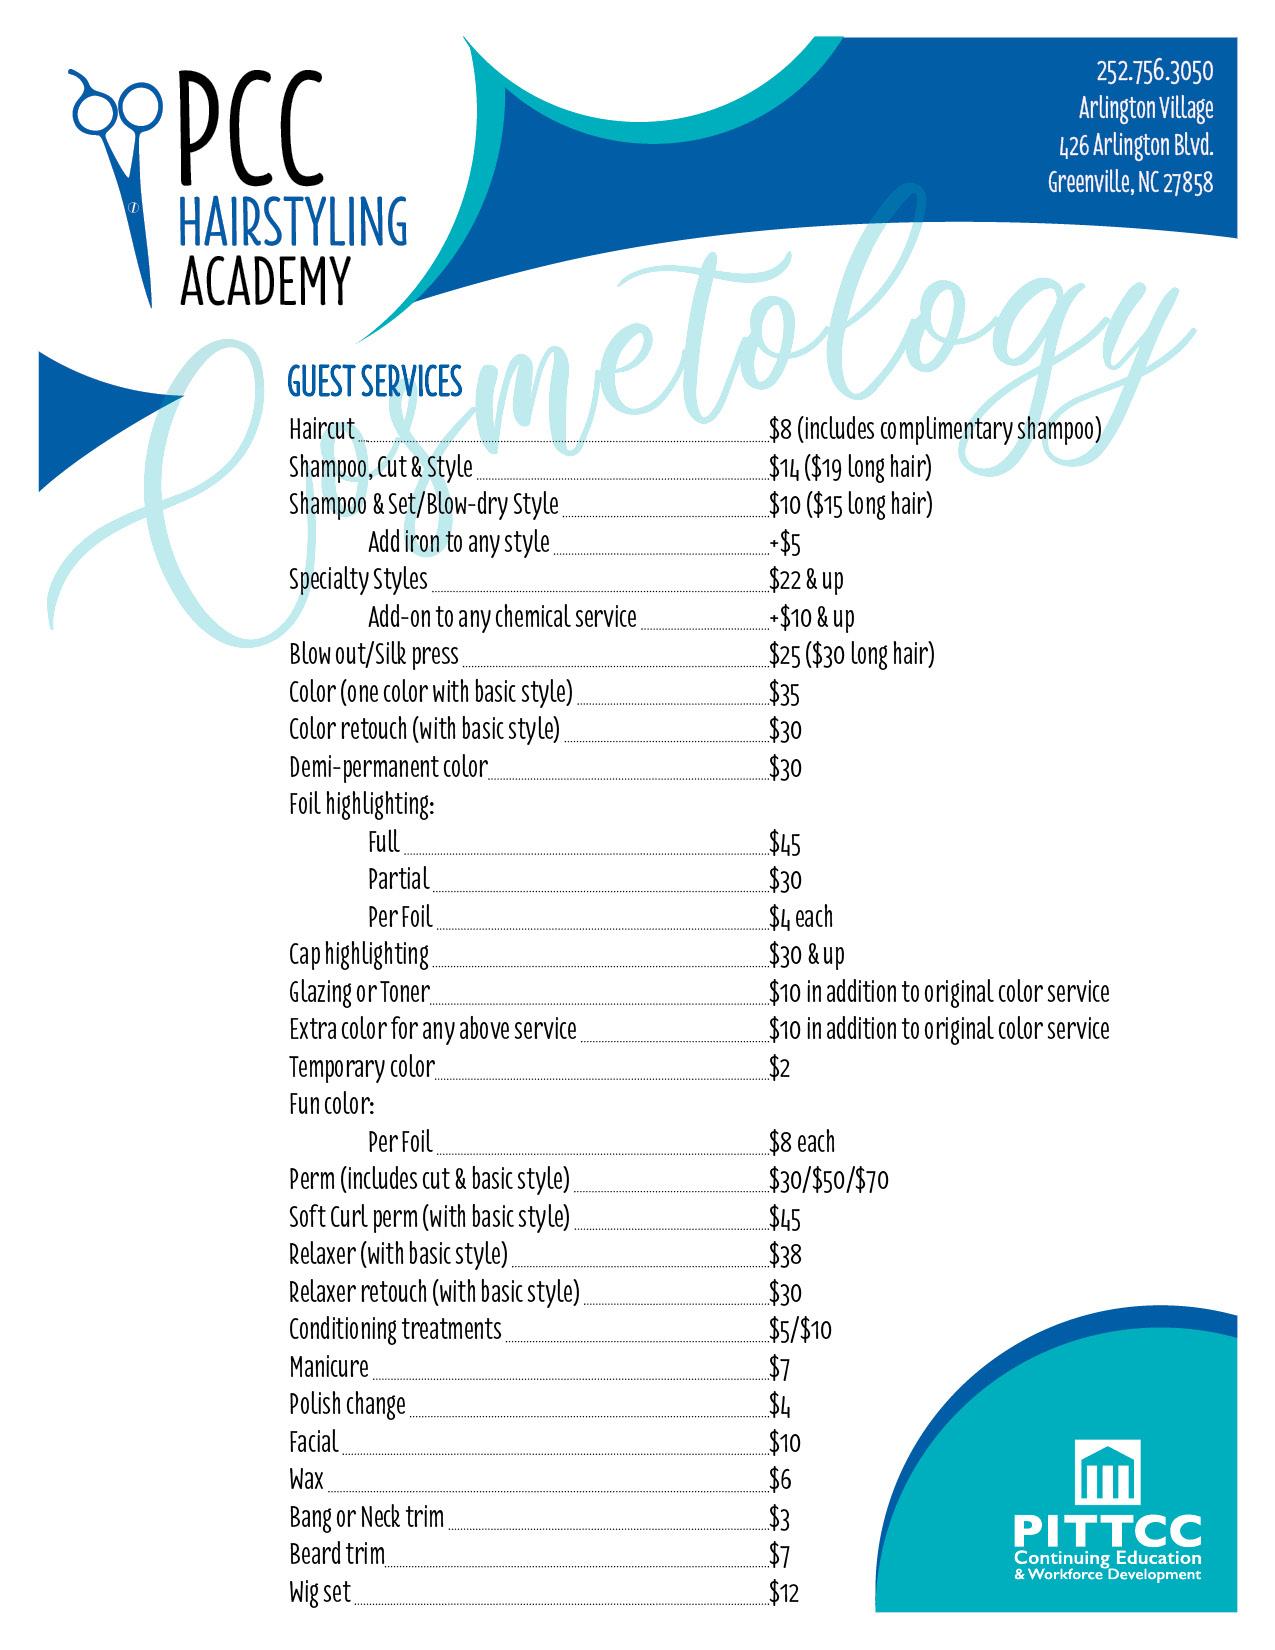 Pcc_Hair_Academy_Services_Spring_2020 - Pitt Community College